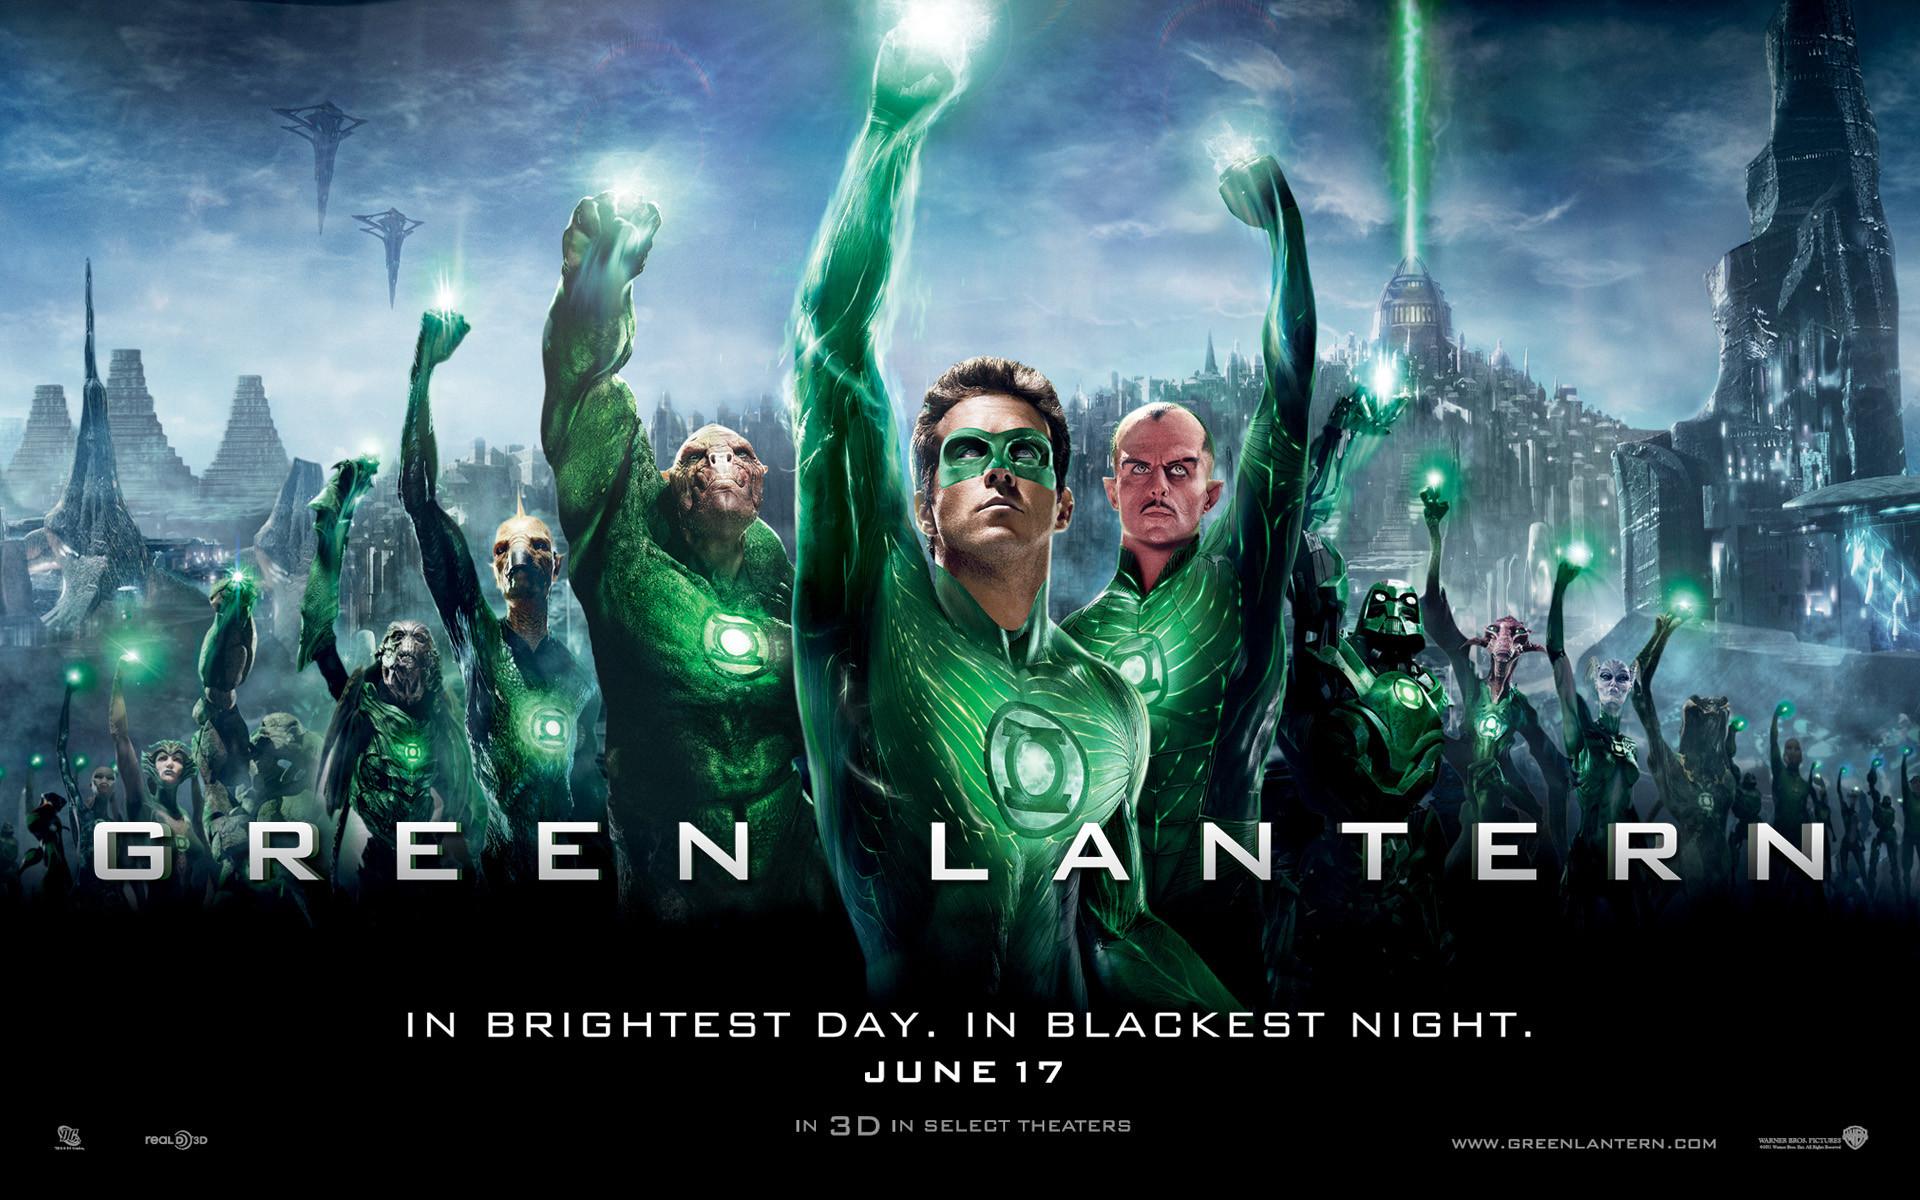 Before Deadpool, Ryan Reynolds was the Green Lantern.